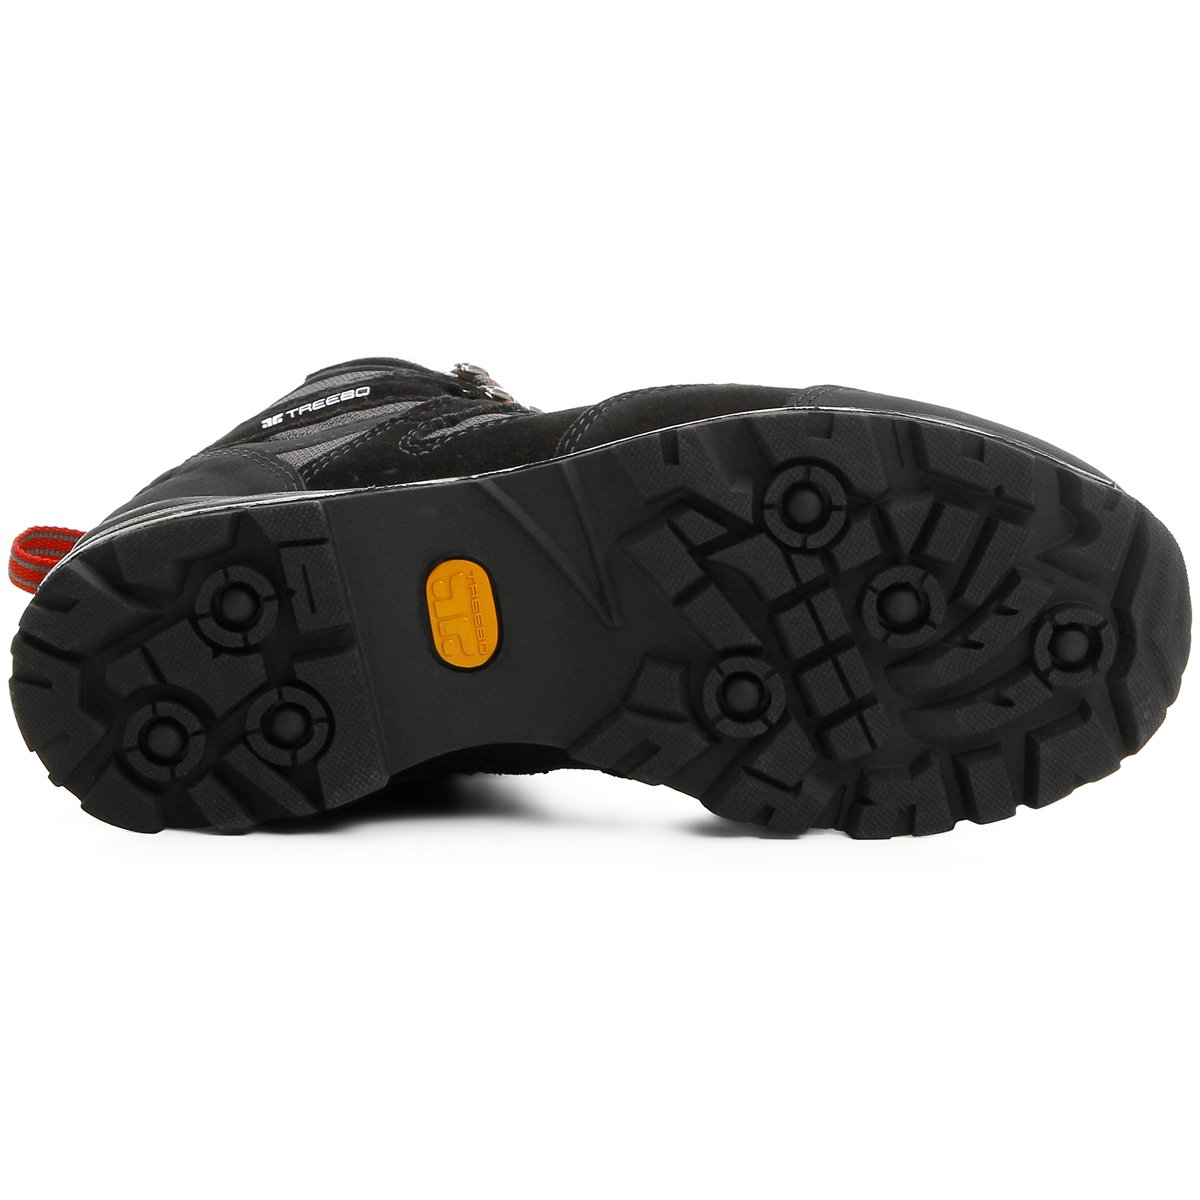 Bota Treebo Laimana - Preto - Compre Agora   Netshoes e051eb2f43